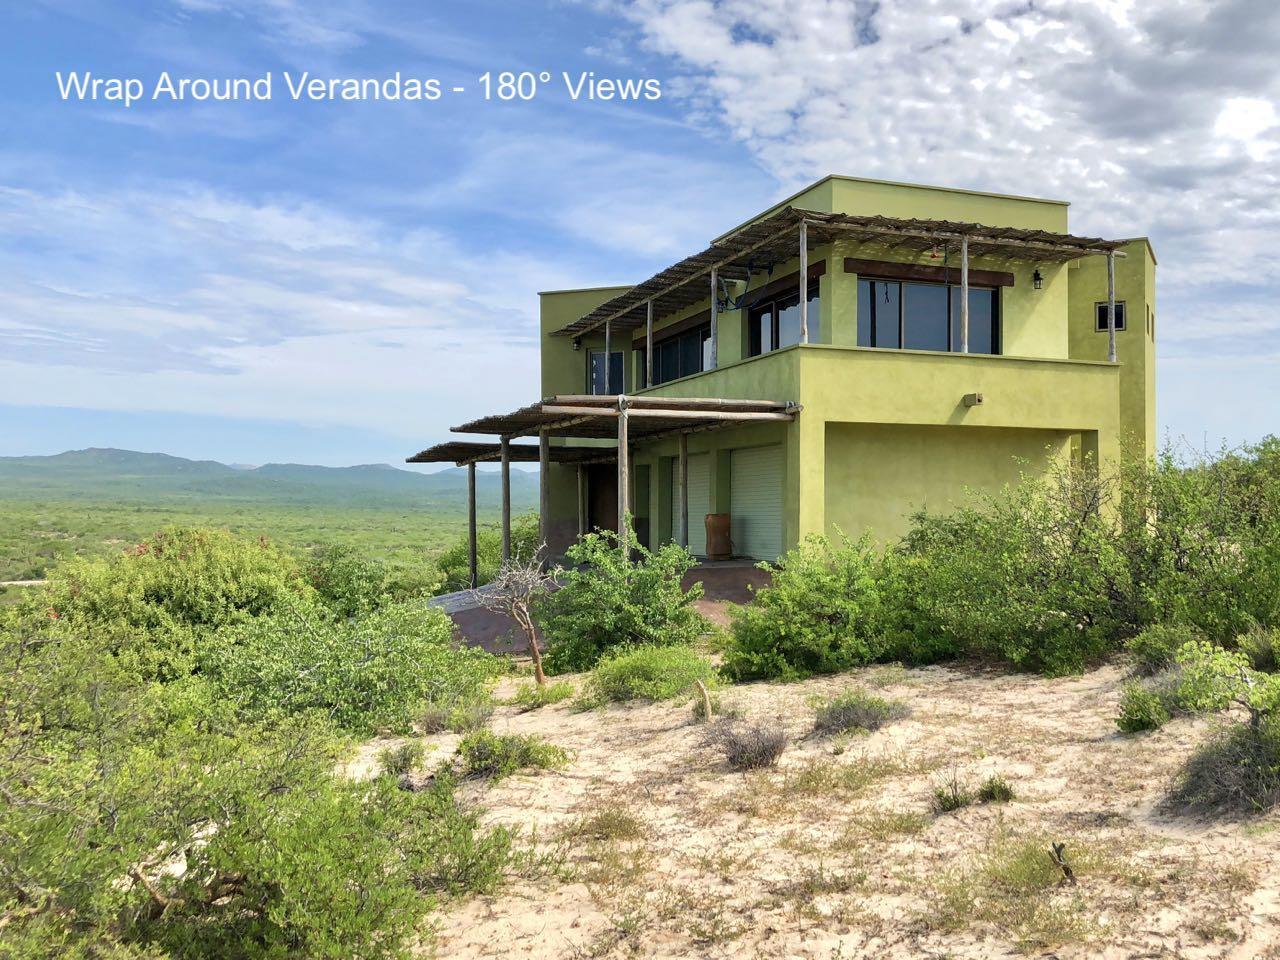 East Cape, 1 Bedroom Bedrooms, ,1 BathroomBathrooms,House,For Sale,Vinorama, Lot 142, Mza 1,19-849